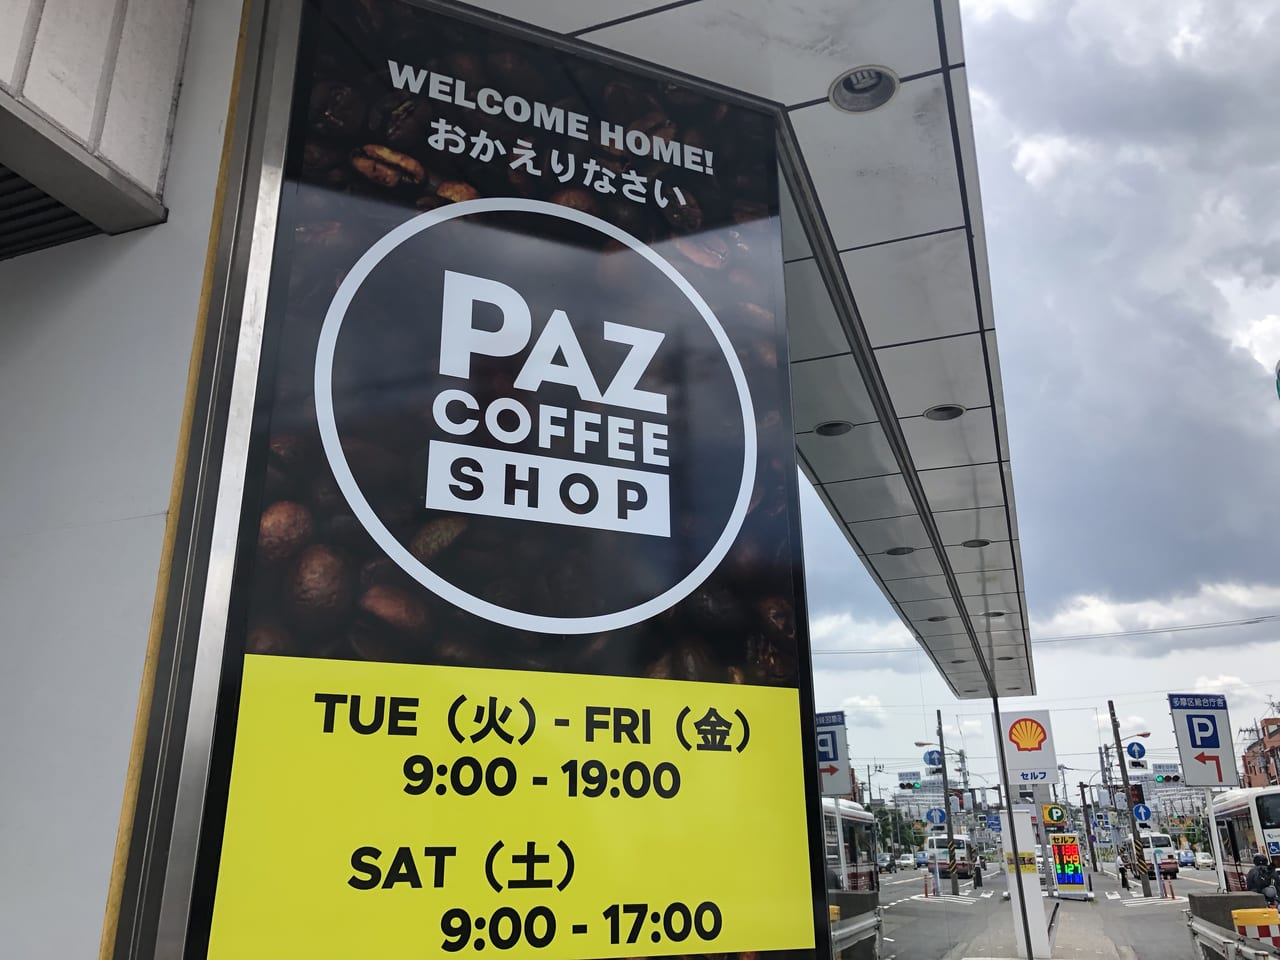 PAZCOFFEESHOP(2019年撮影)